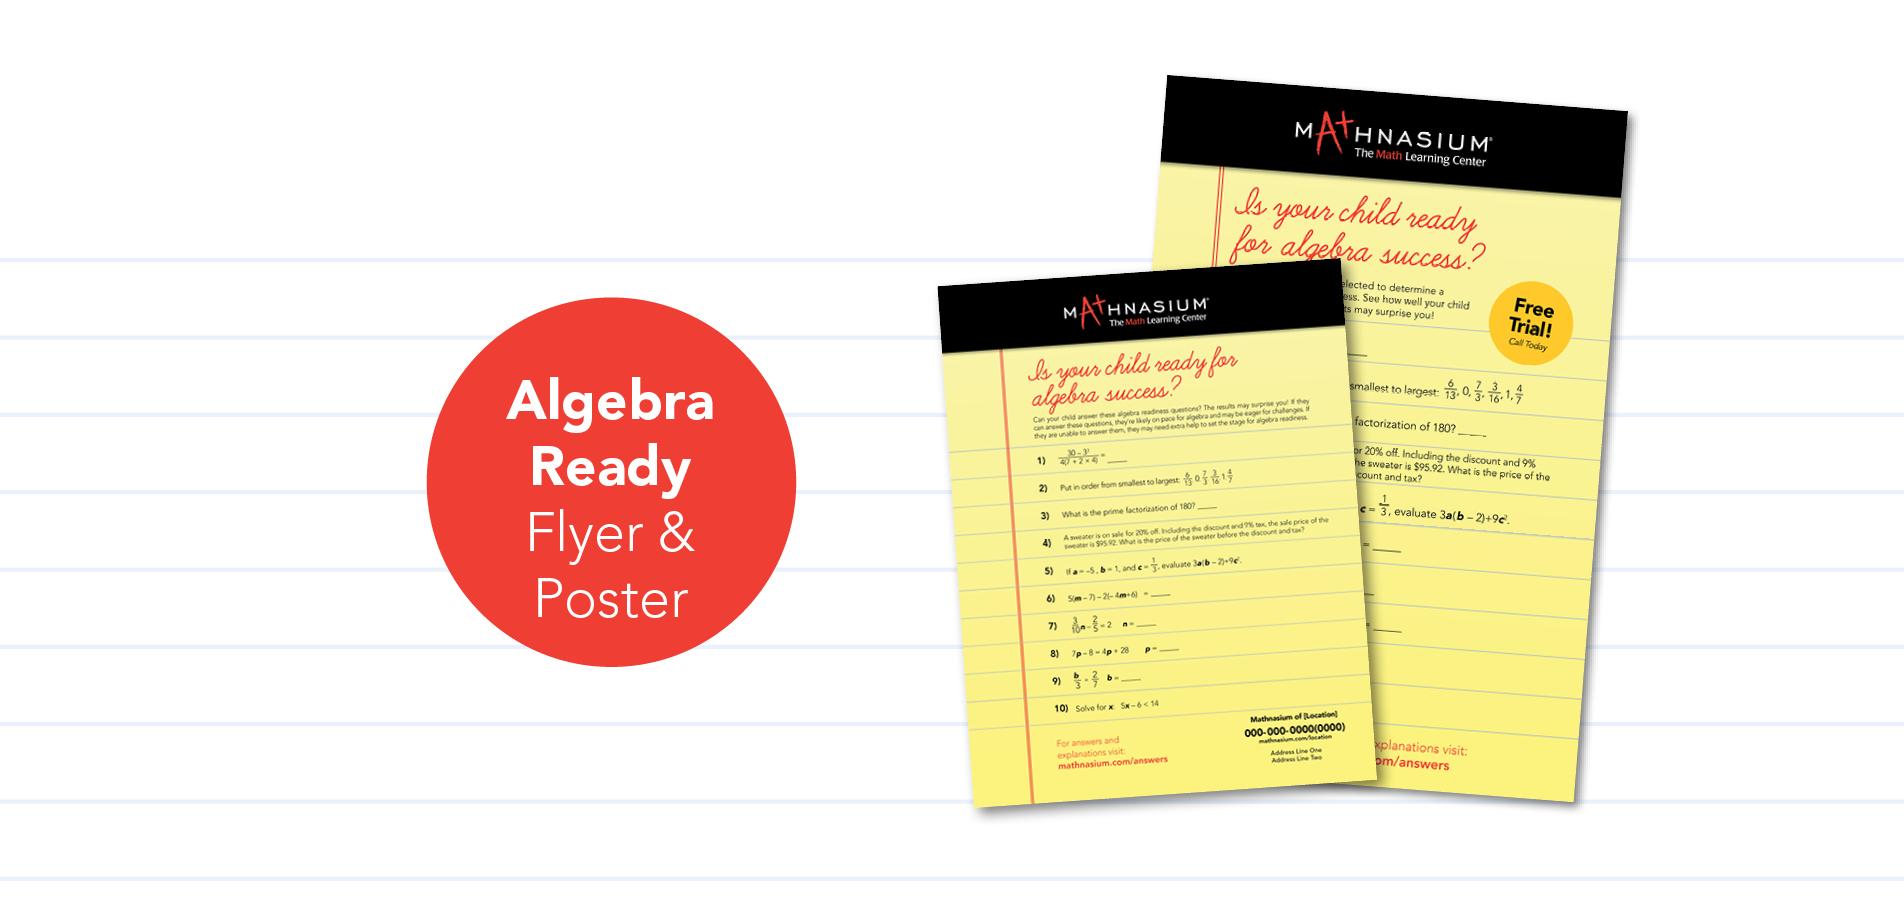 Sample-Email-Algebra-Ready-Poster-Flyer-2016